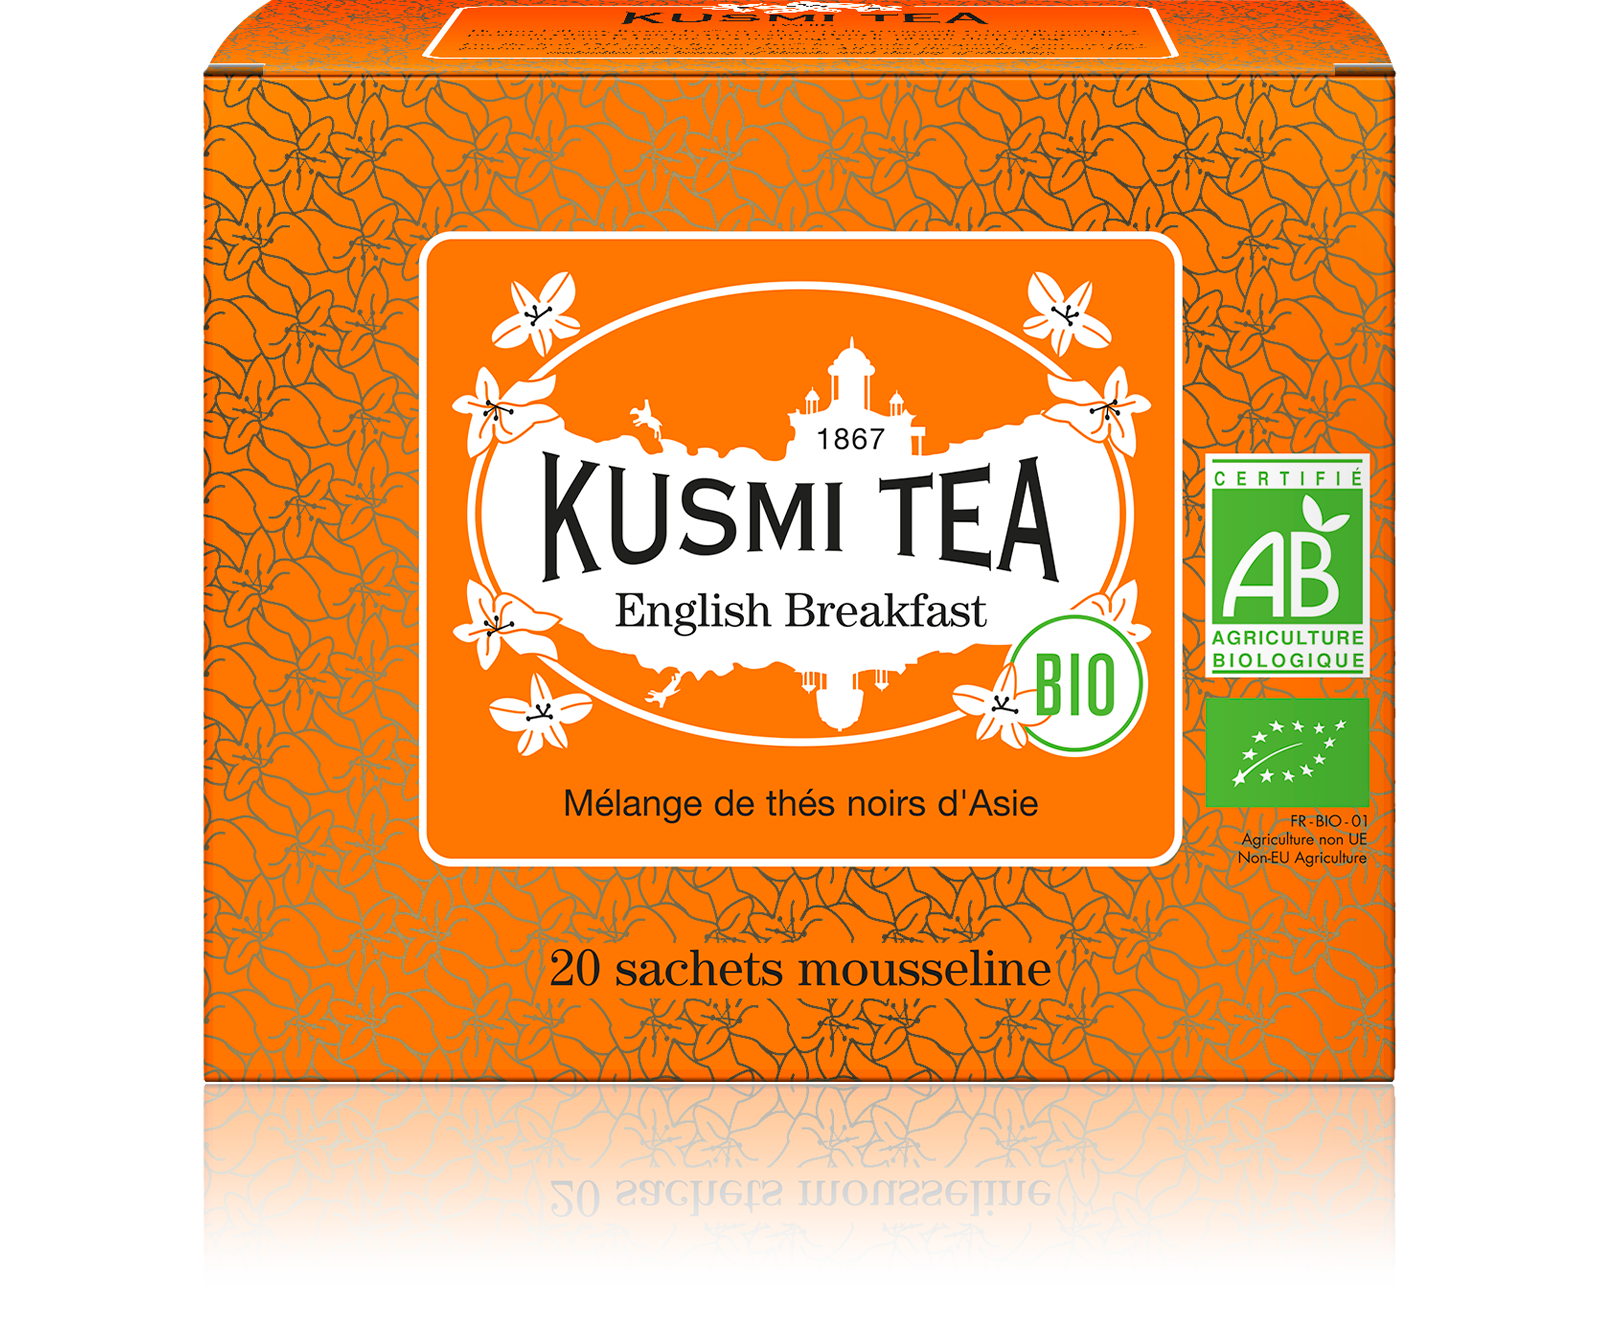 Thé noir sachet - English Breakfast Bio - Kusmi Tea